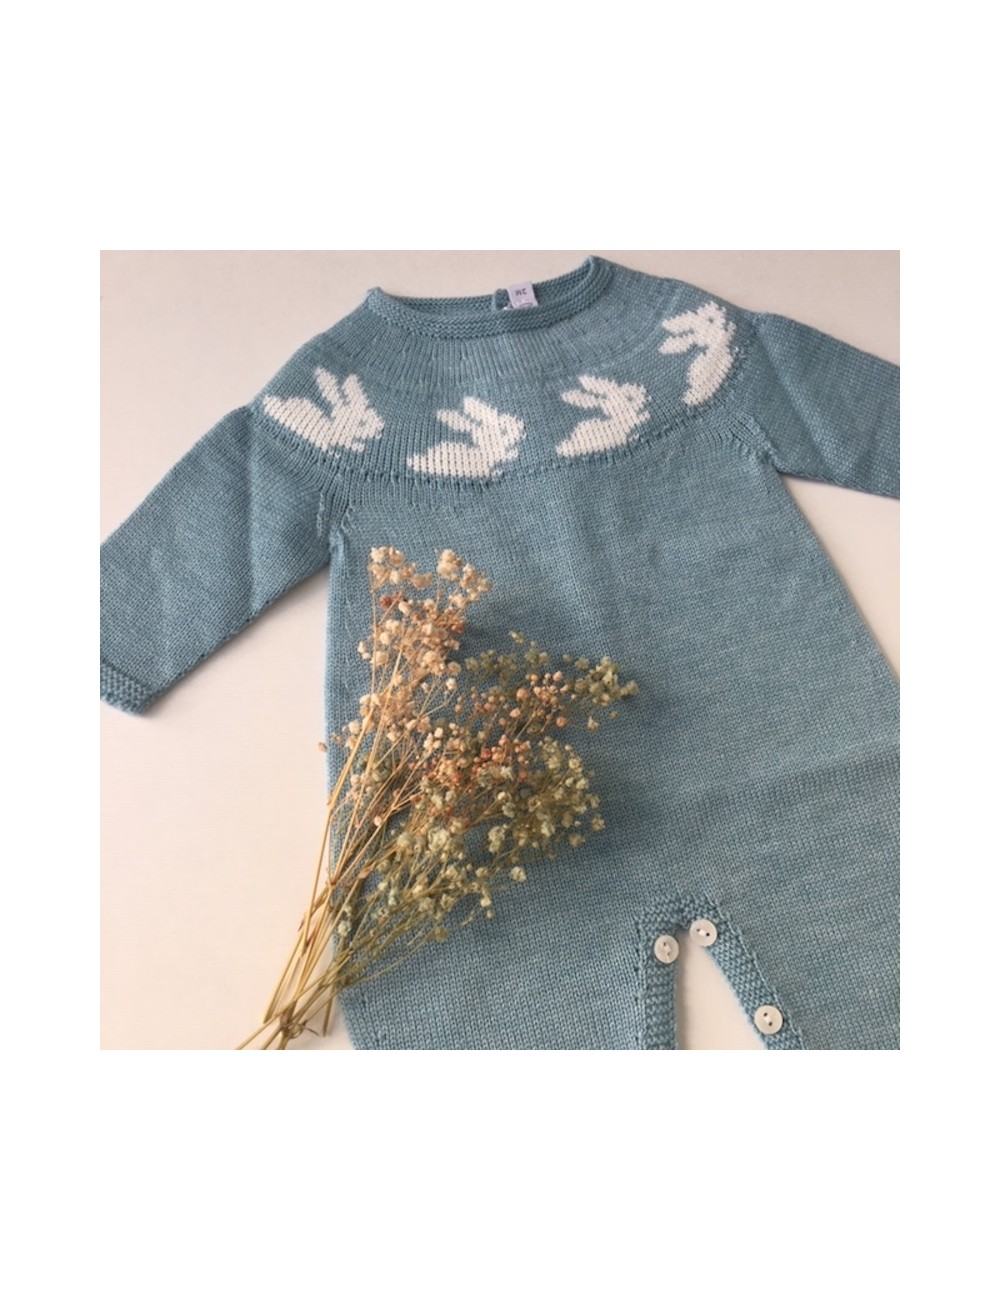 Pelele para bebe azul turquesa con cenefa de conejitos Paloma de la o